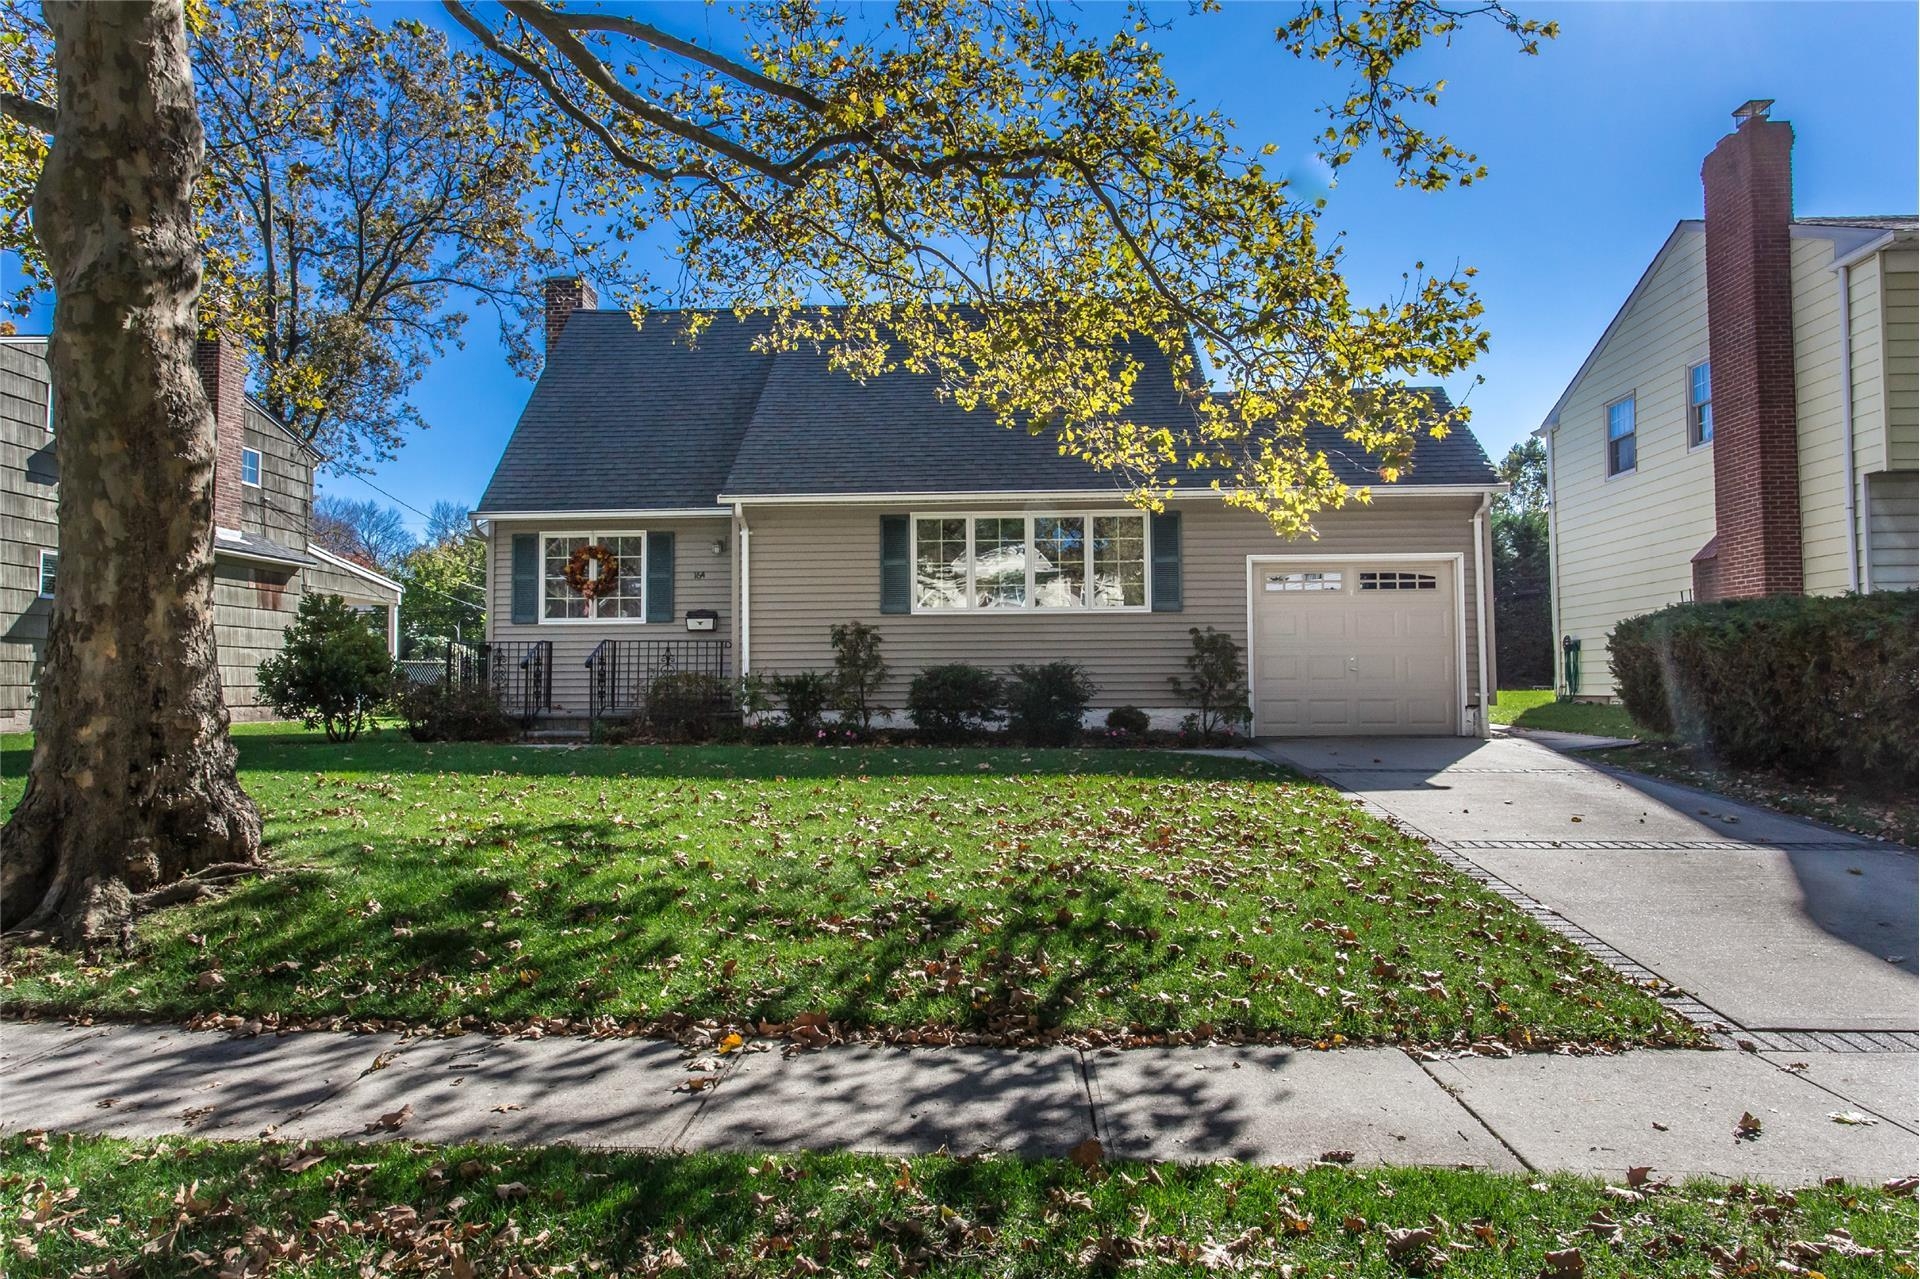 164 Garden St, Garden City, NY 11530 - Estimate and Home Details ...